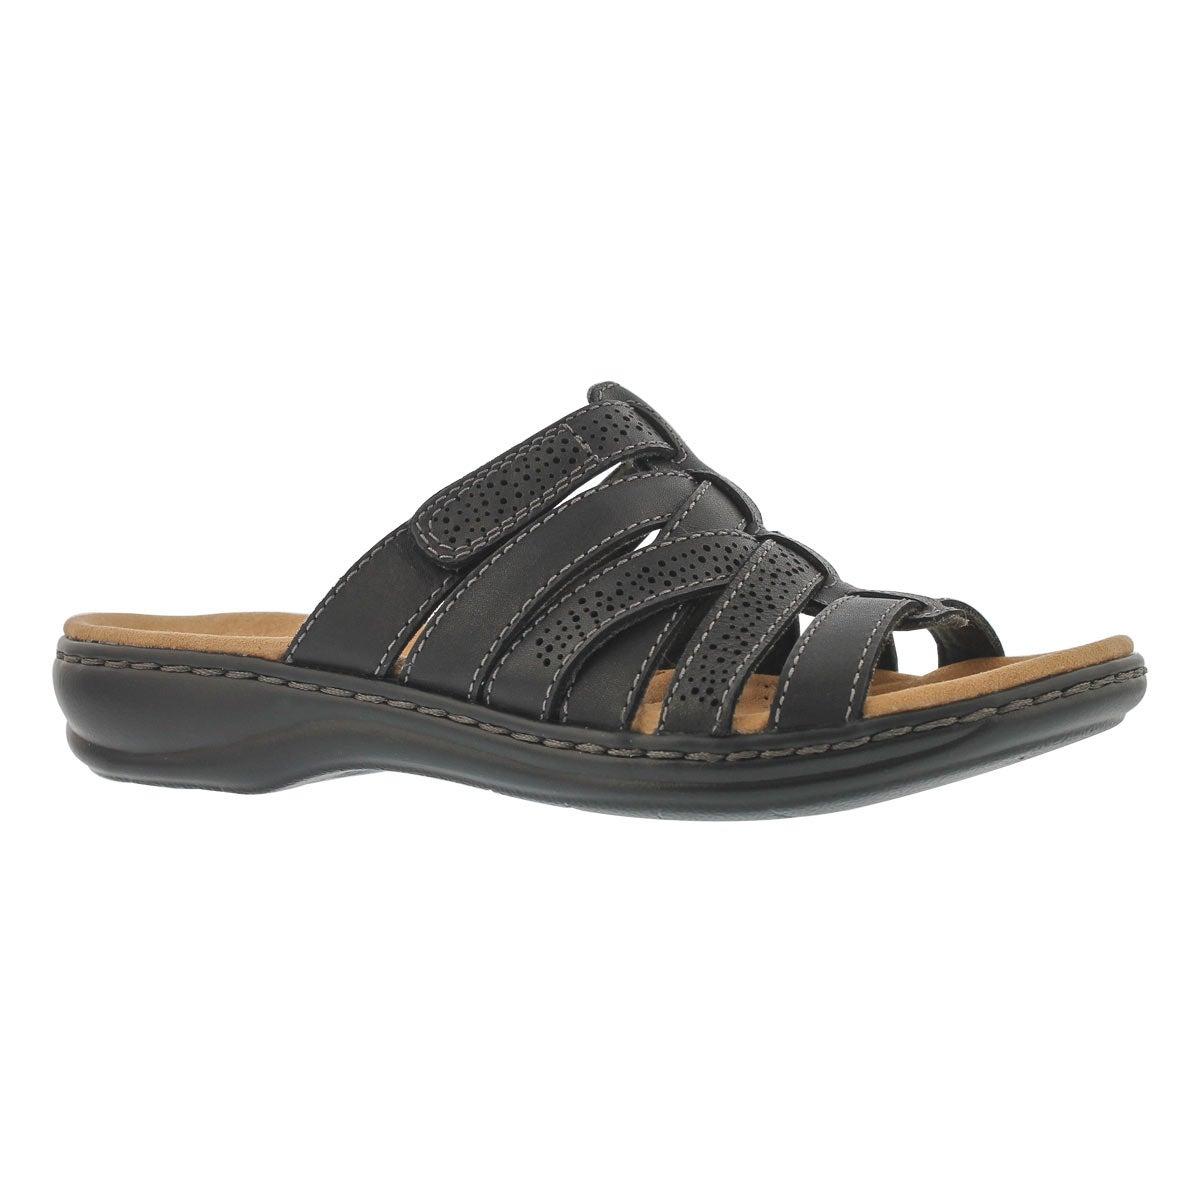 Women's LEISA FIELD black casual slide sandals